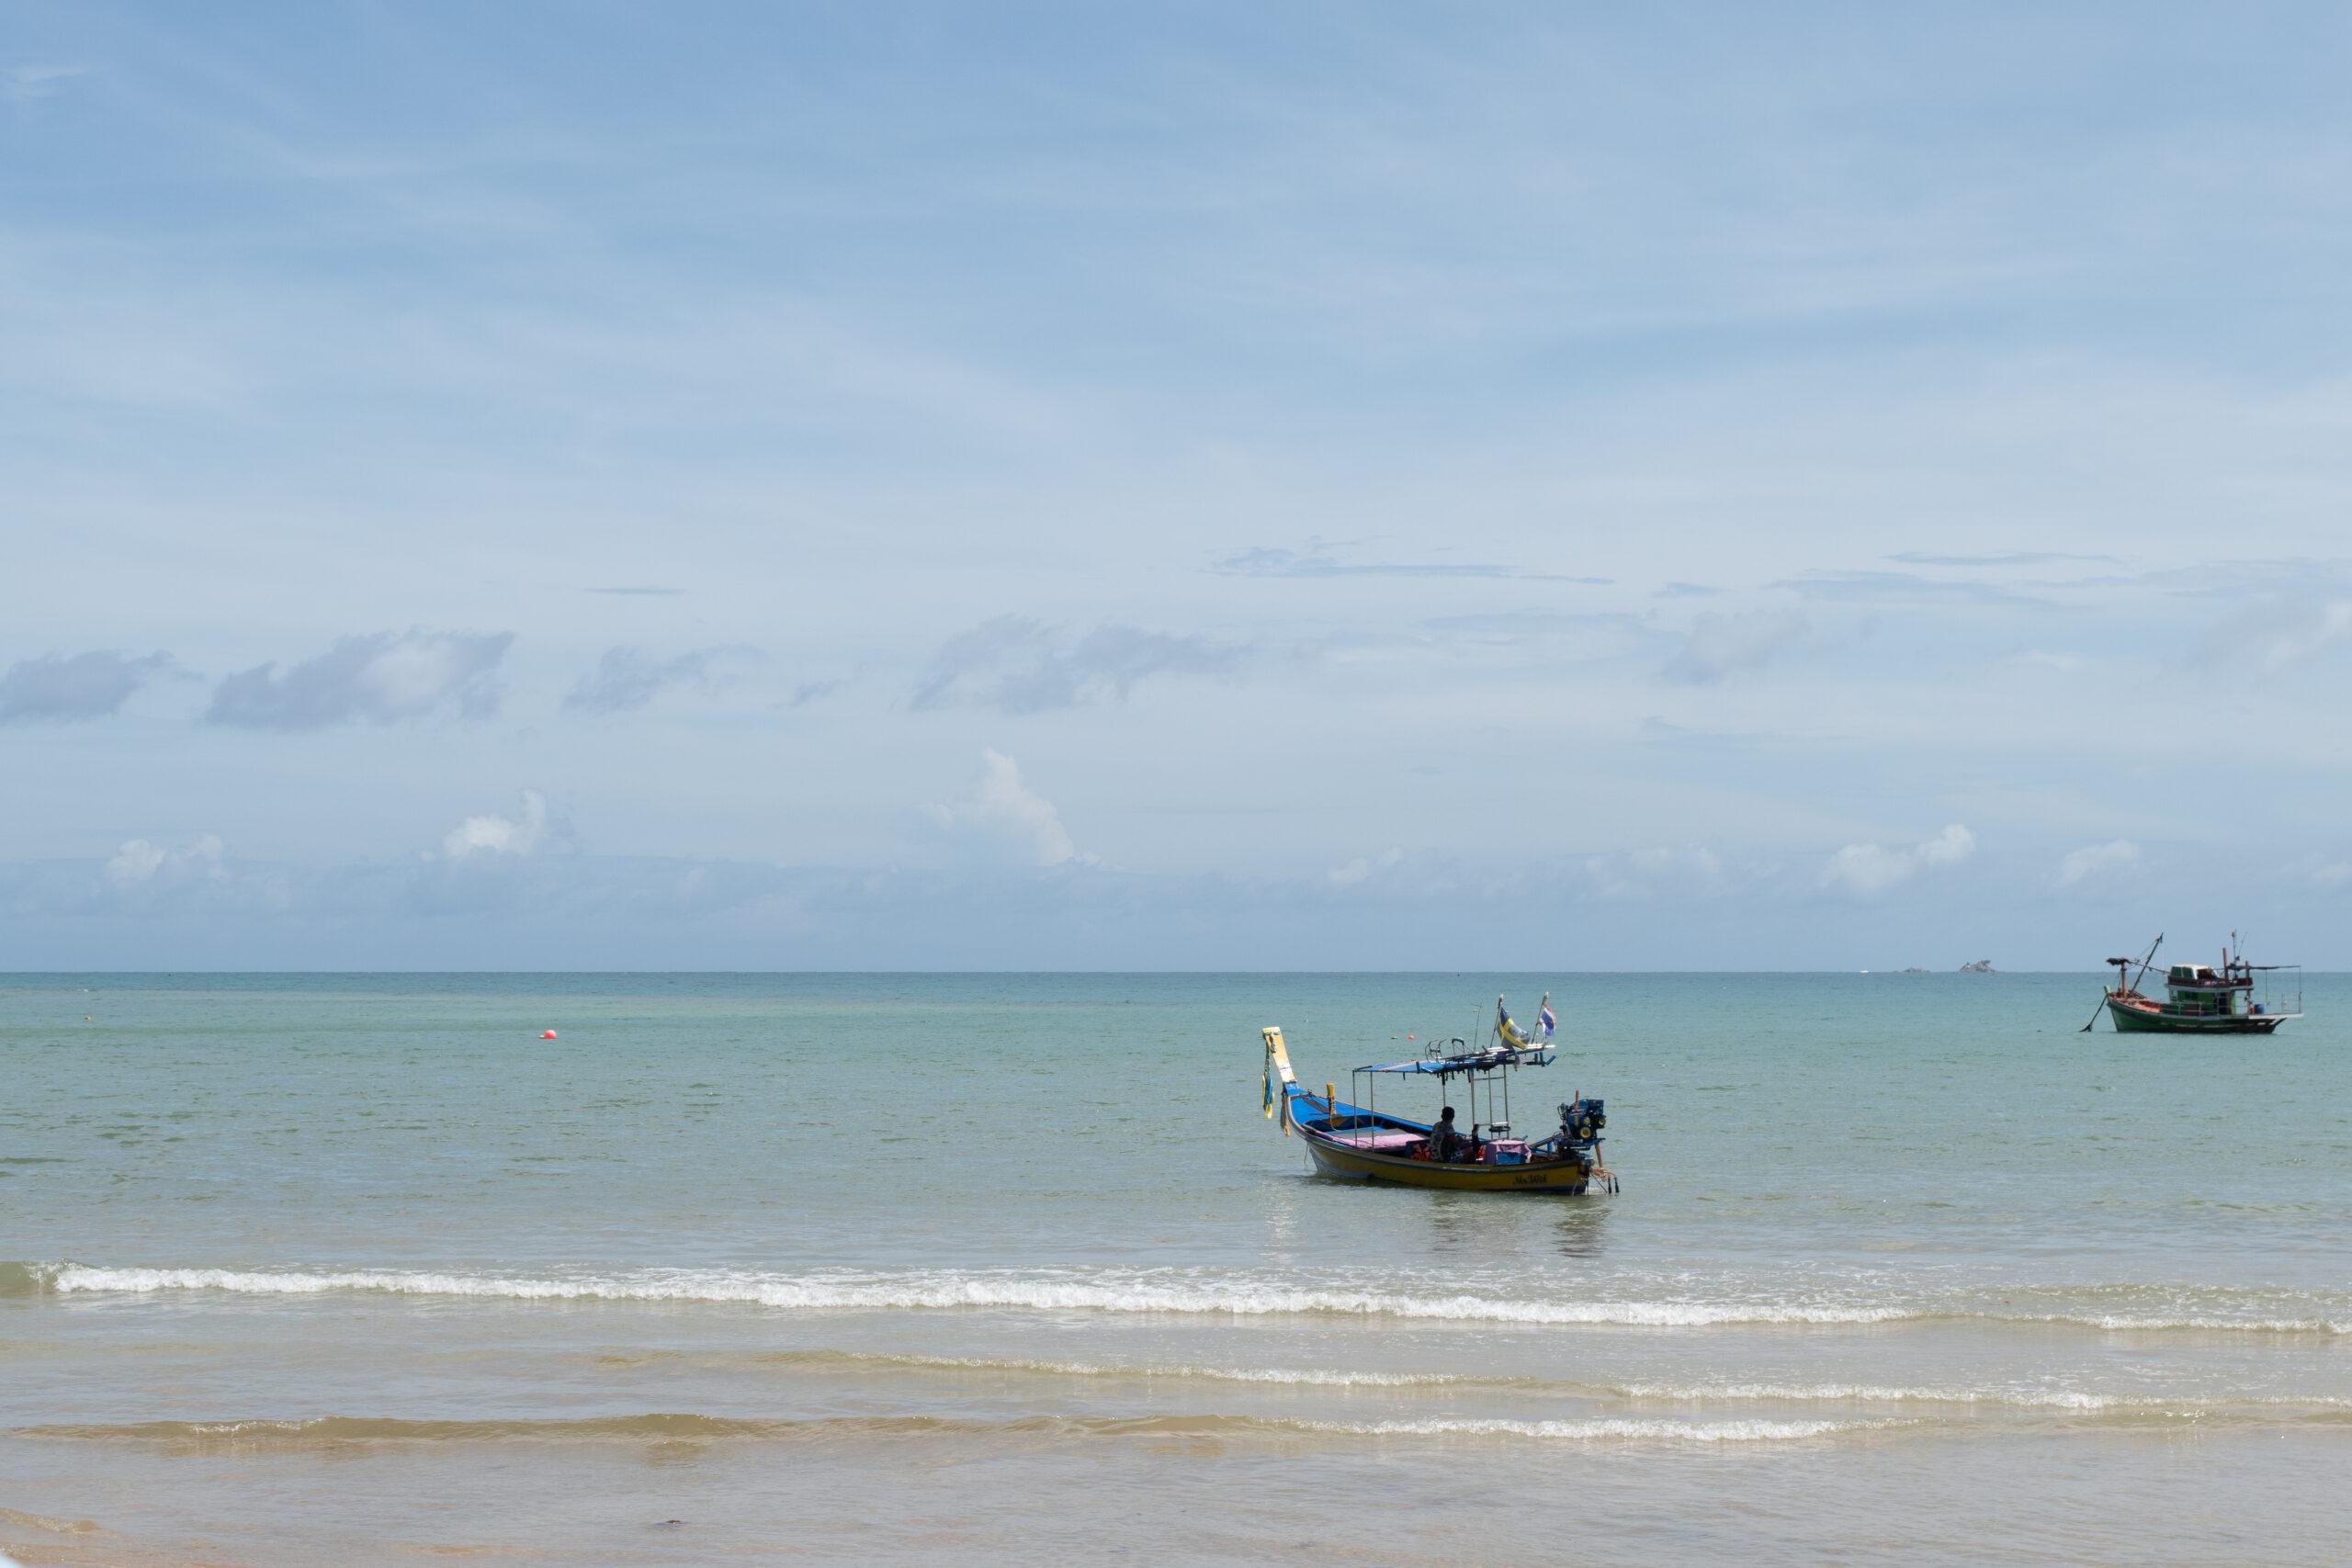 LUKE_a_Phuket_DSC_0959